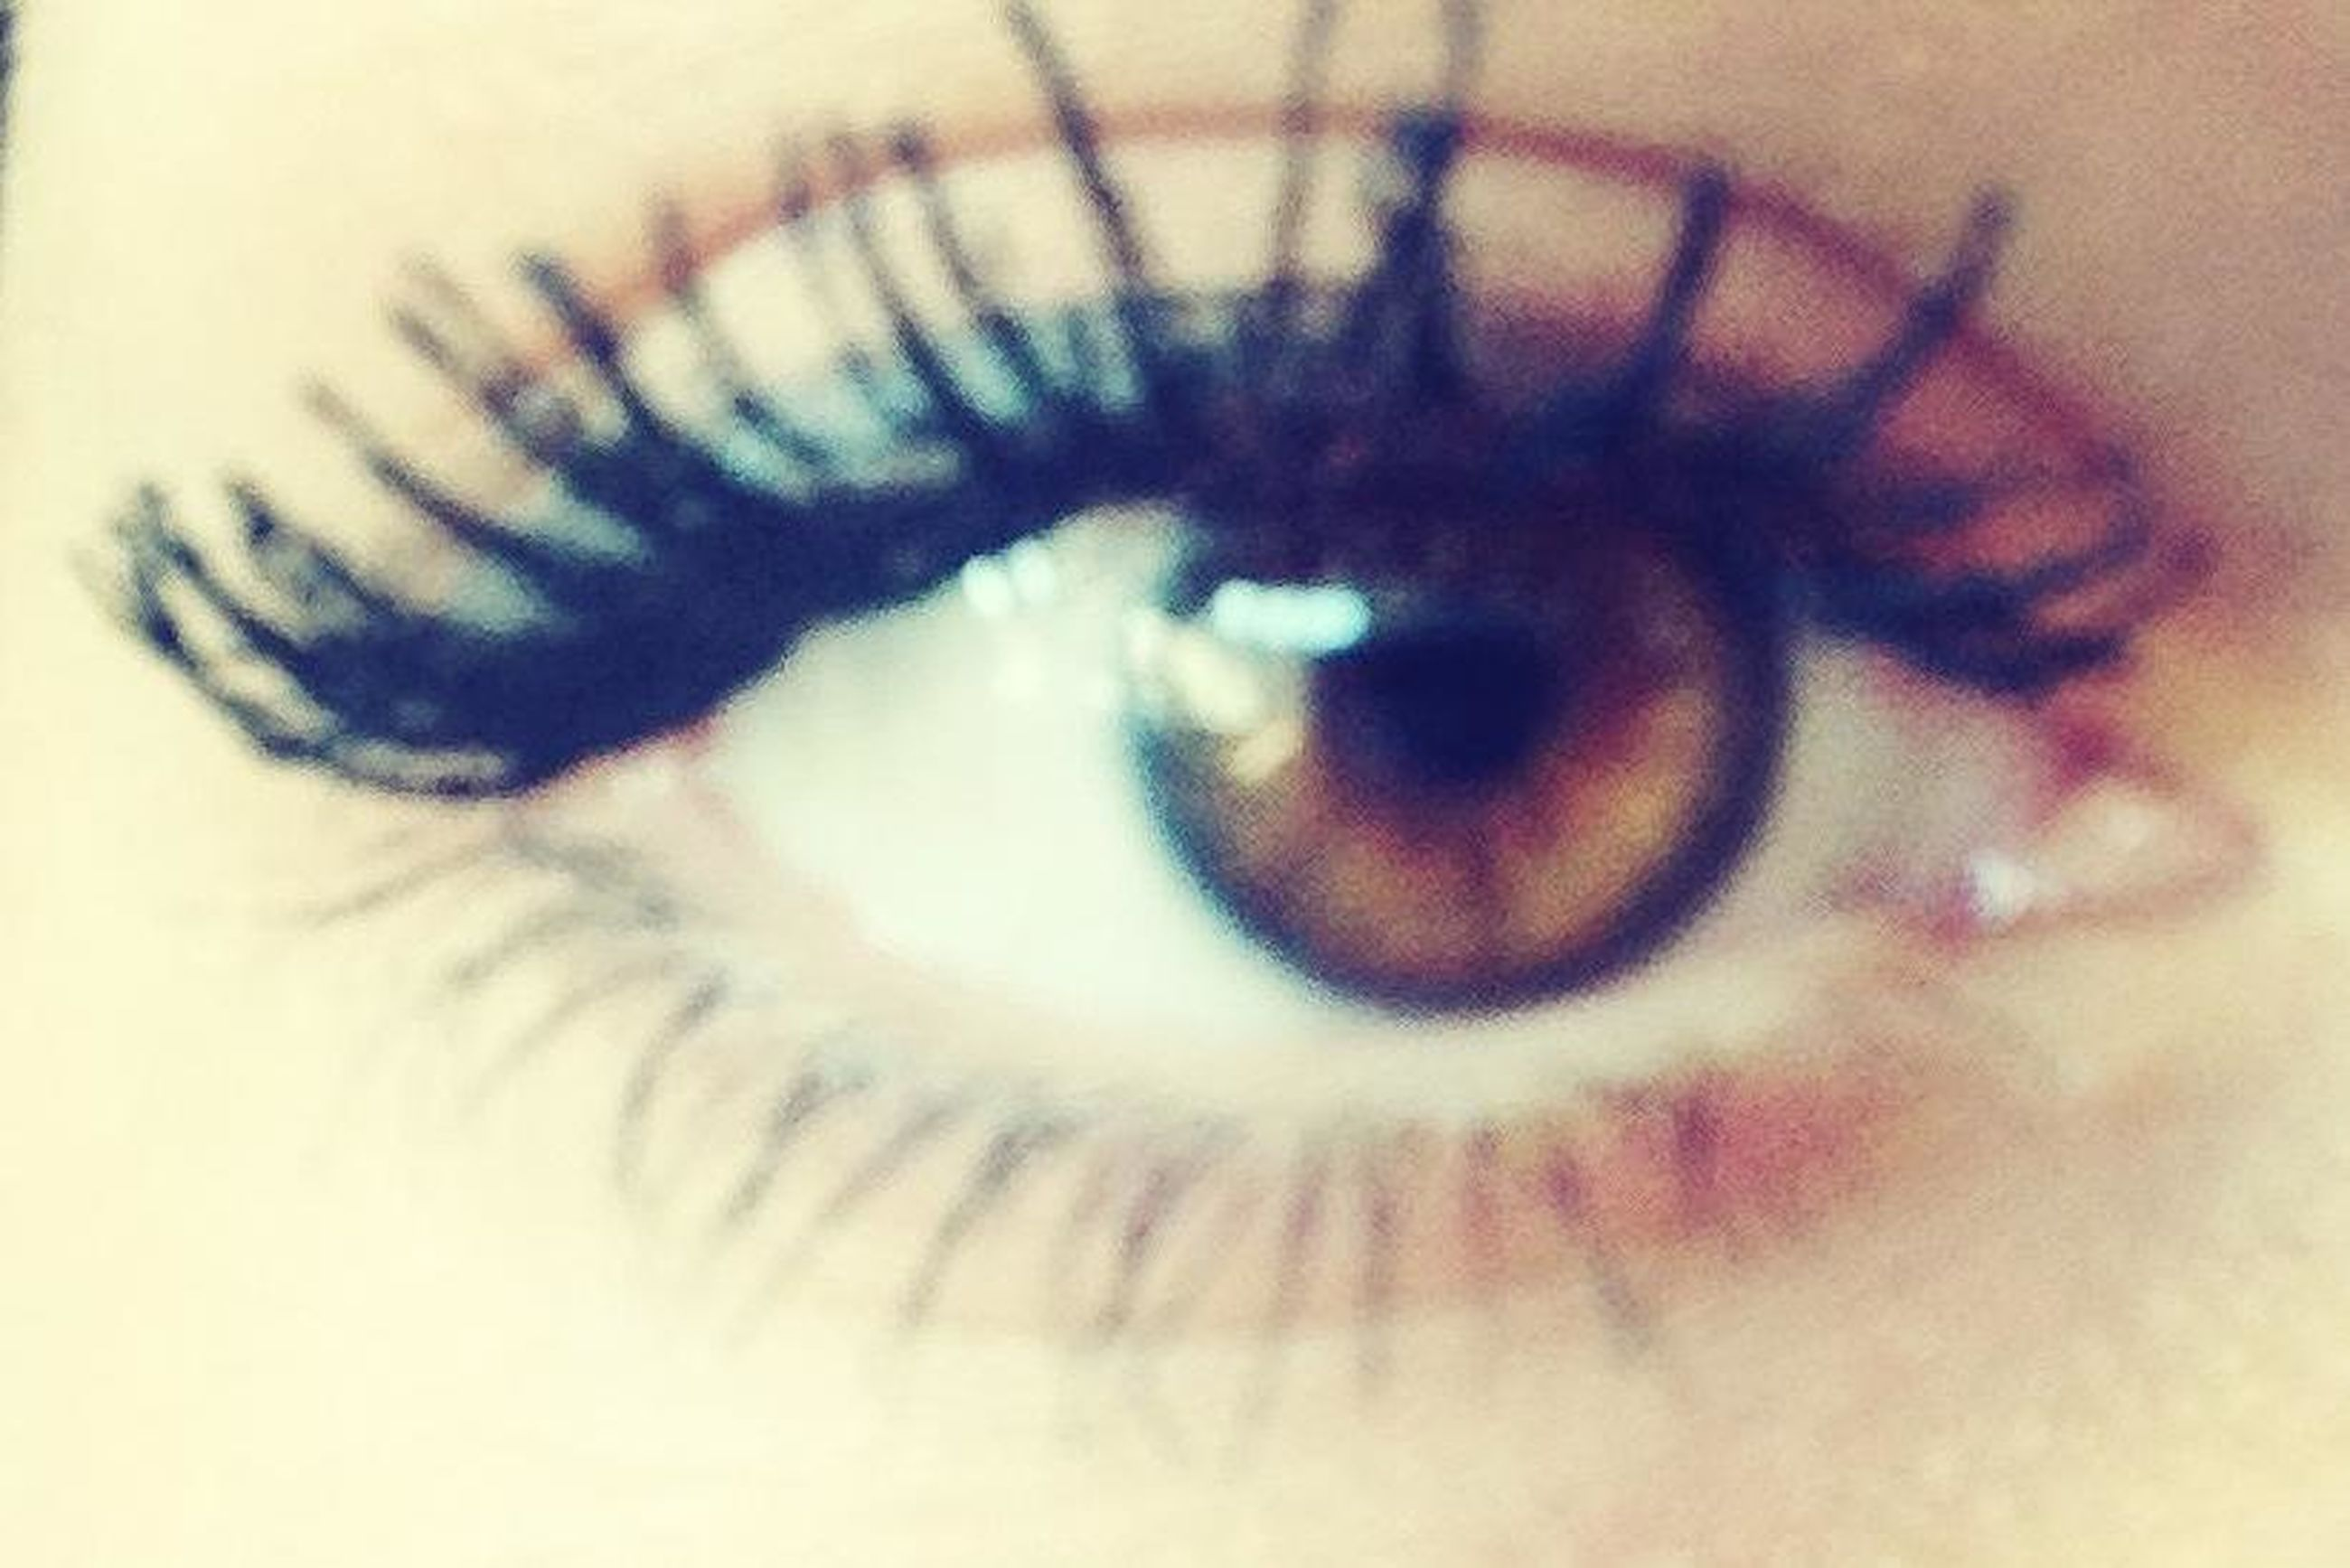 human eye, eyelash, eyesight, close-up, sensory perception, eyeball, part of, indoors, looking at camera, iris - eye, extreme close-up, portrait, unrecognizable person, human skin, vision, one animal, pets